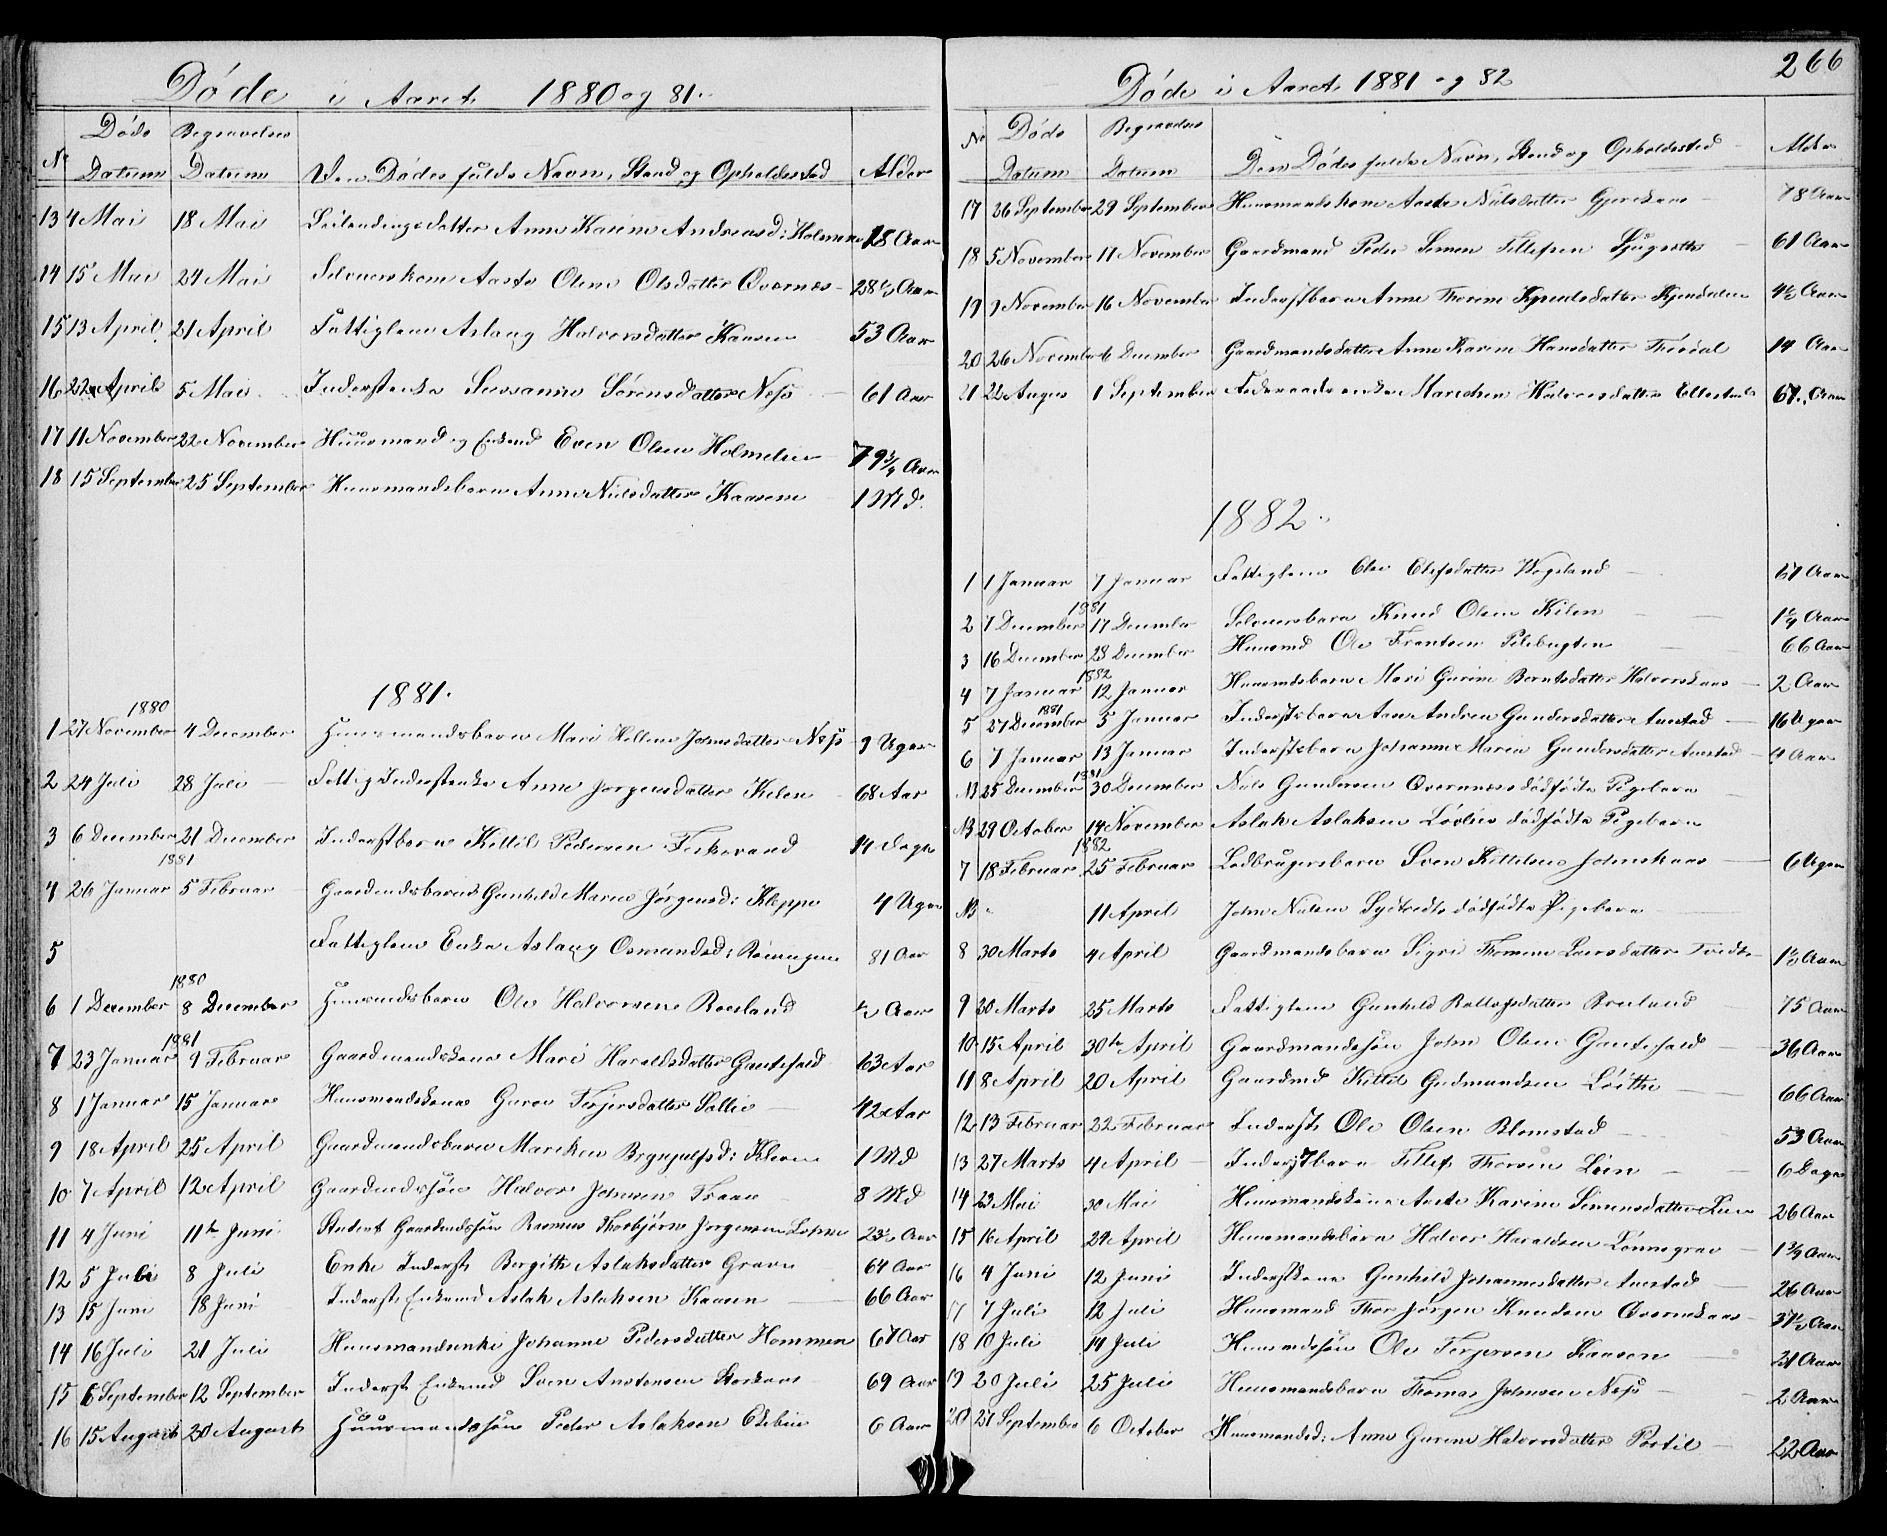 SAKO, Drangedal kirkebøker, G/Gb/L0001: Klokkerbok nr. II 1, 1856-1894, s. 266